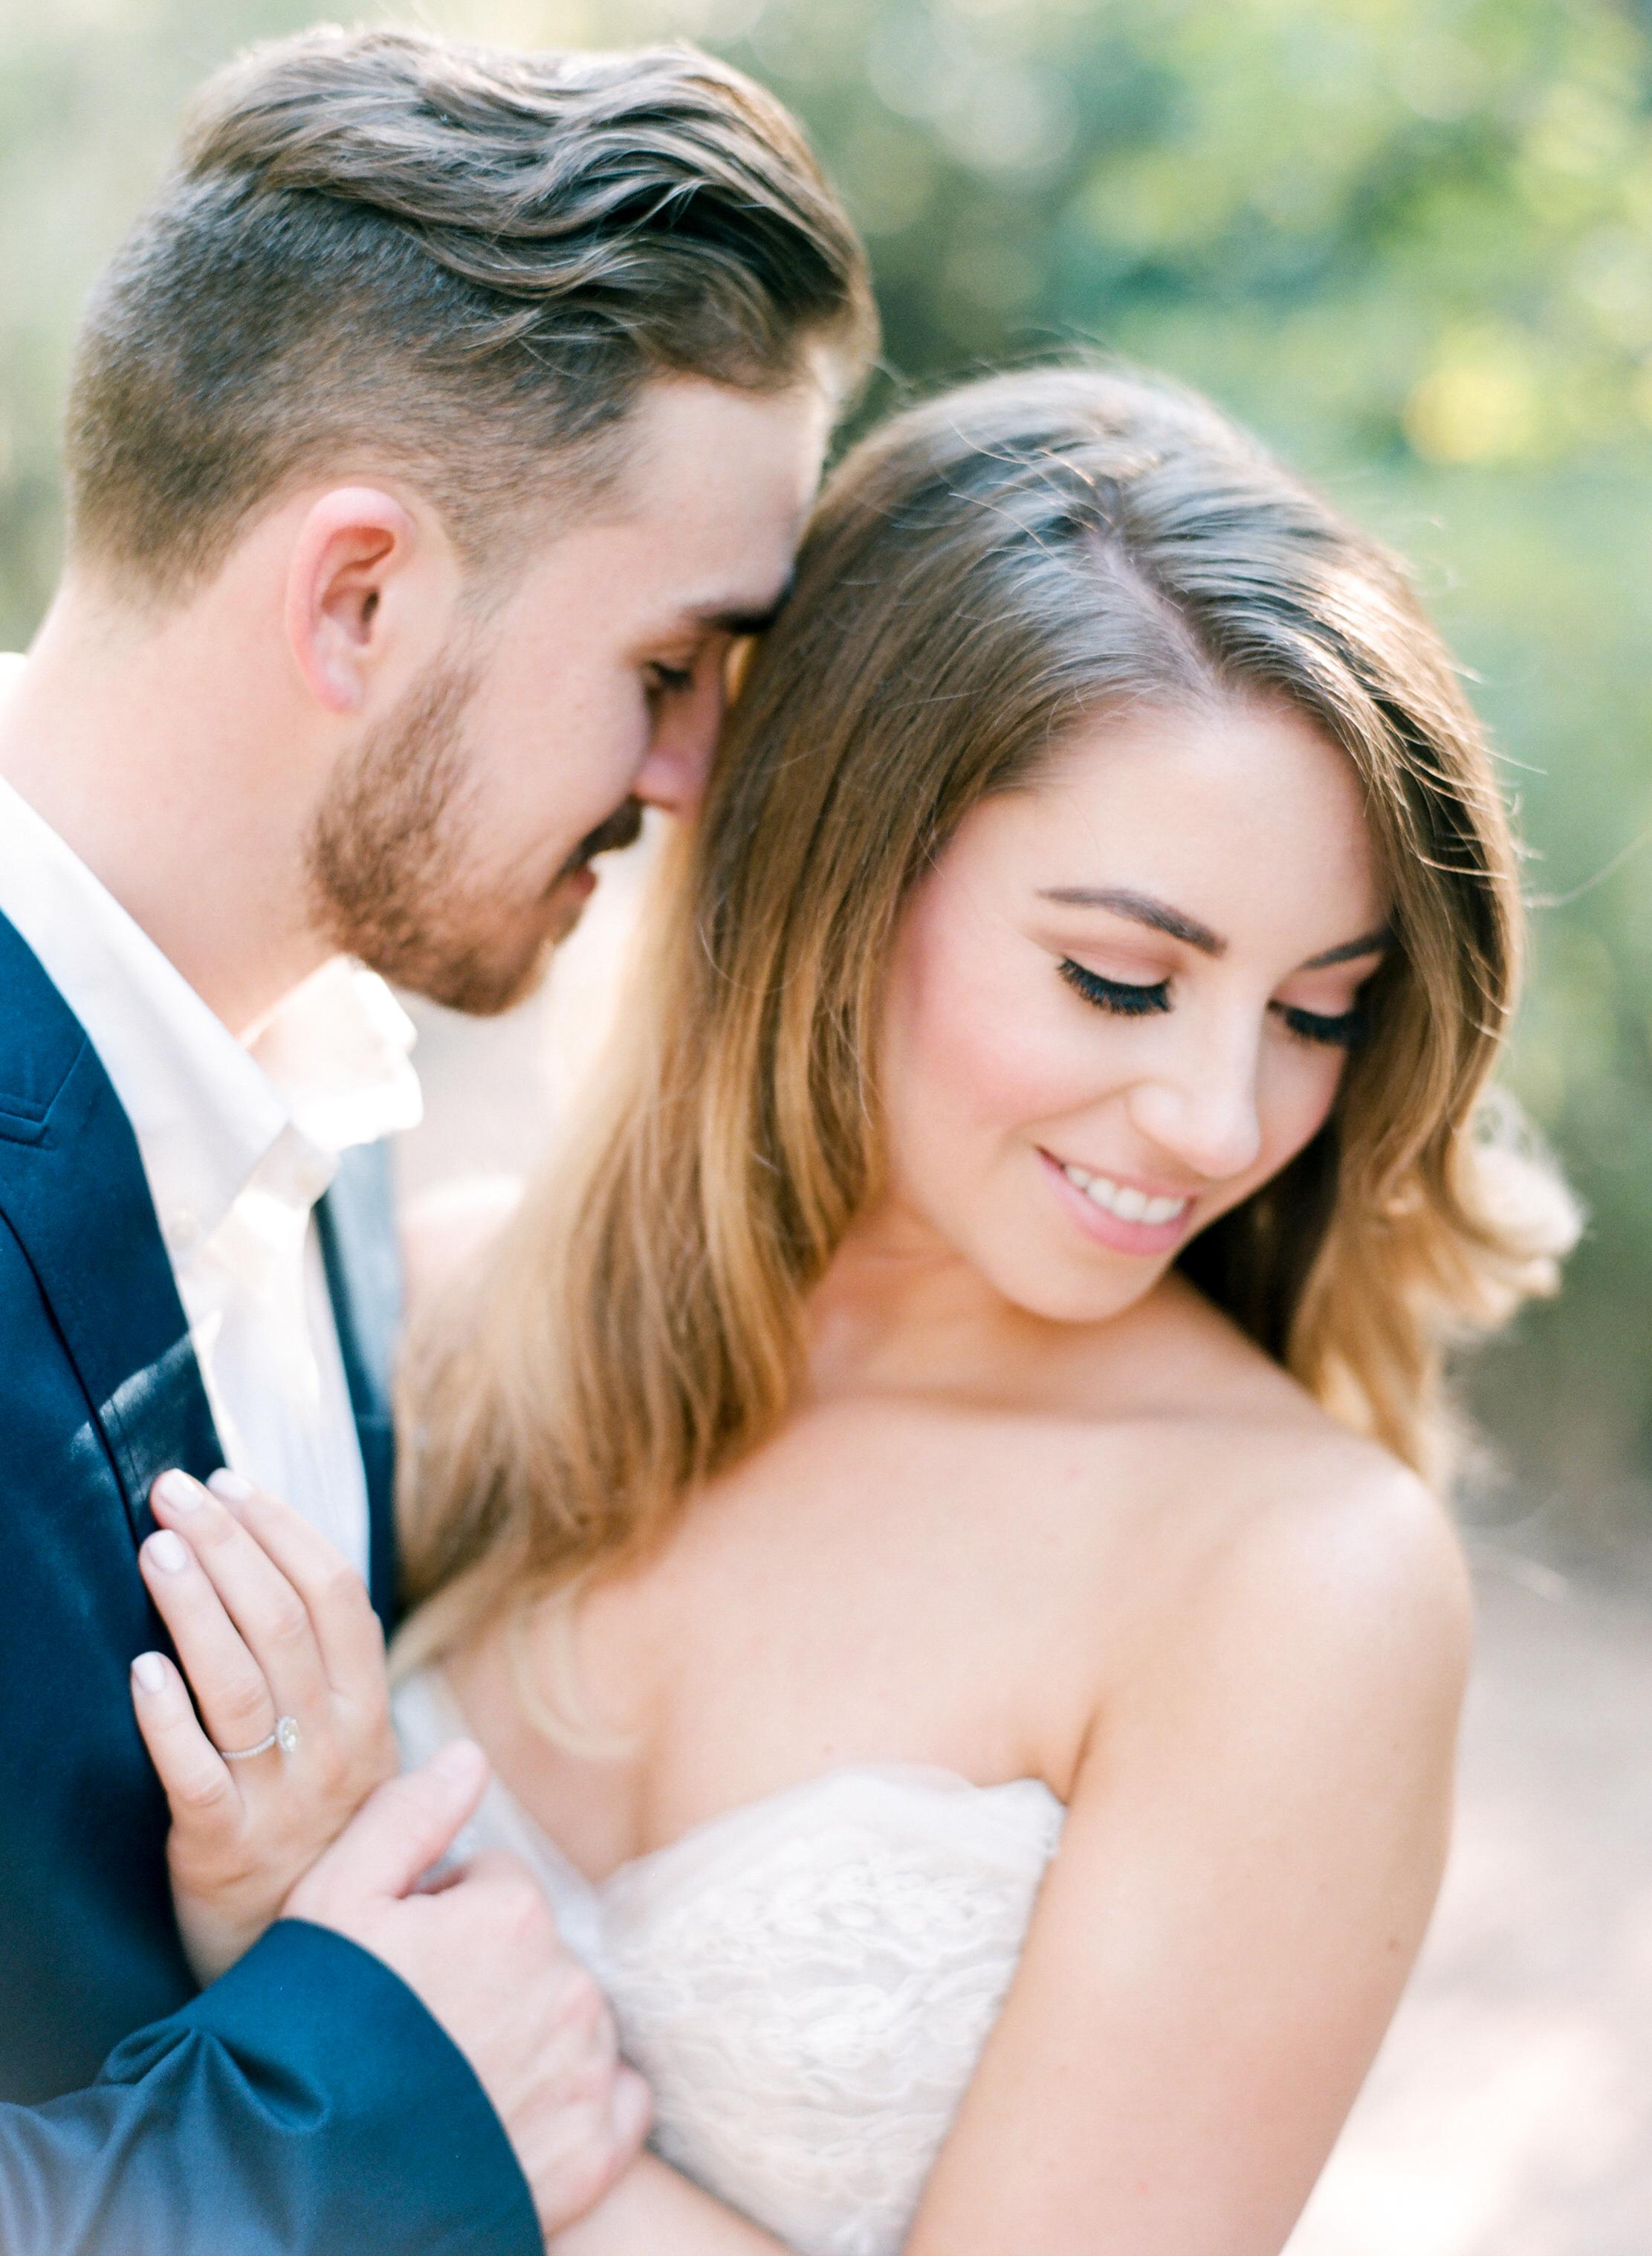 dana-fernandez-photography-the-wedding-chicks-film-houston-wedding-photography-destination-7.jpg